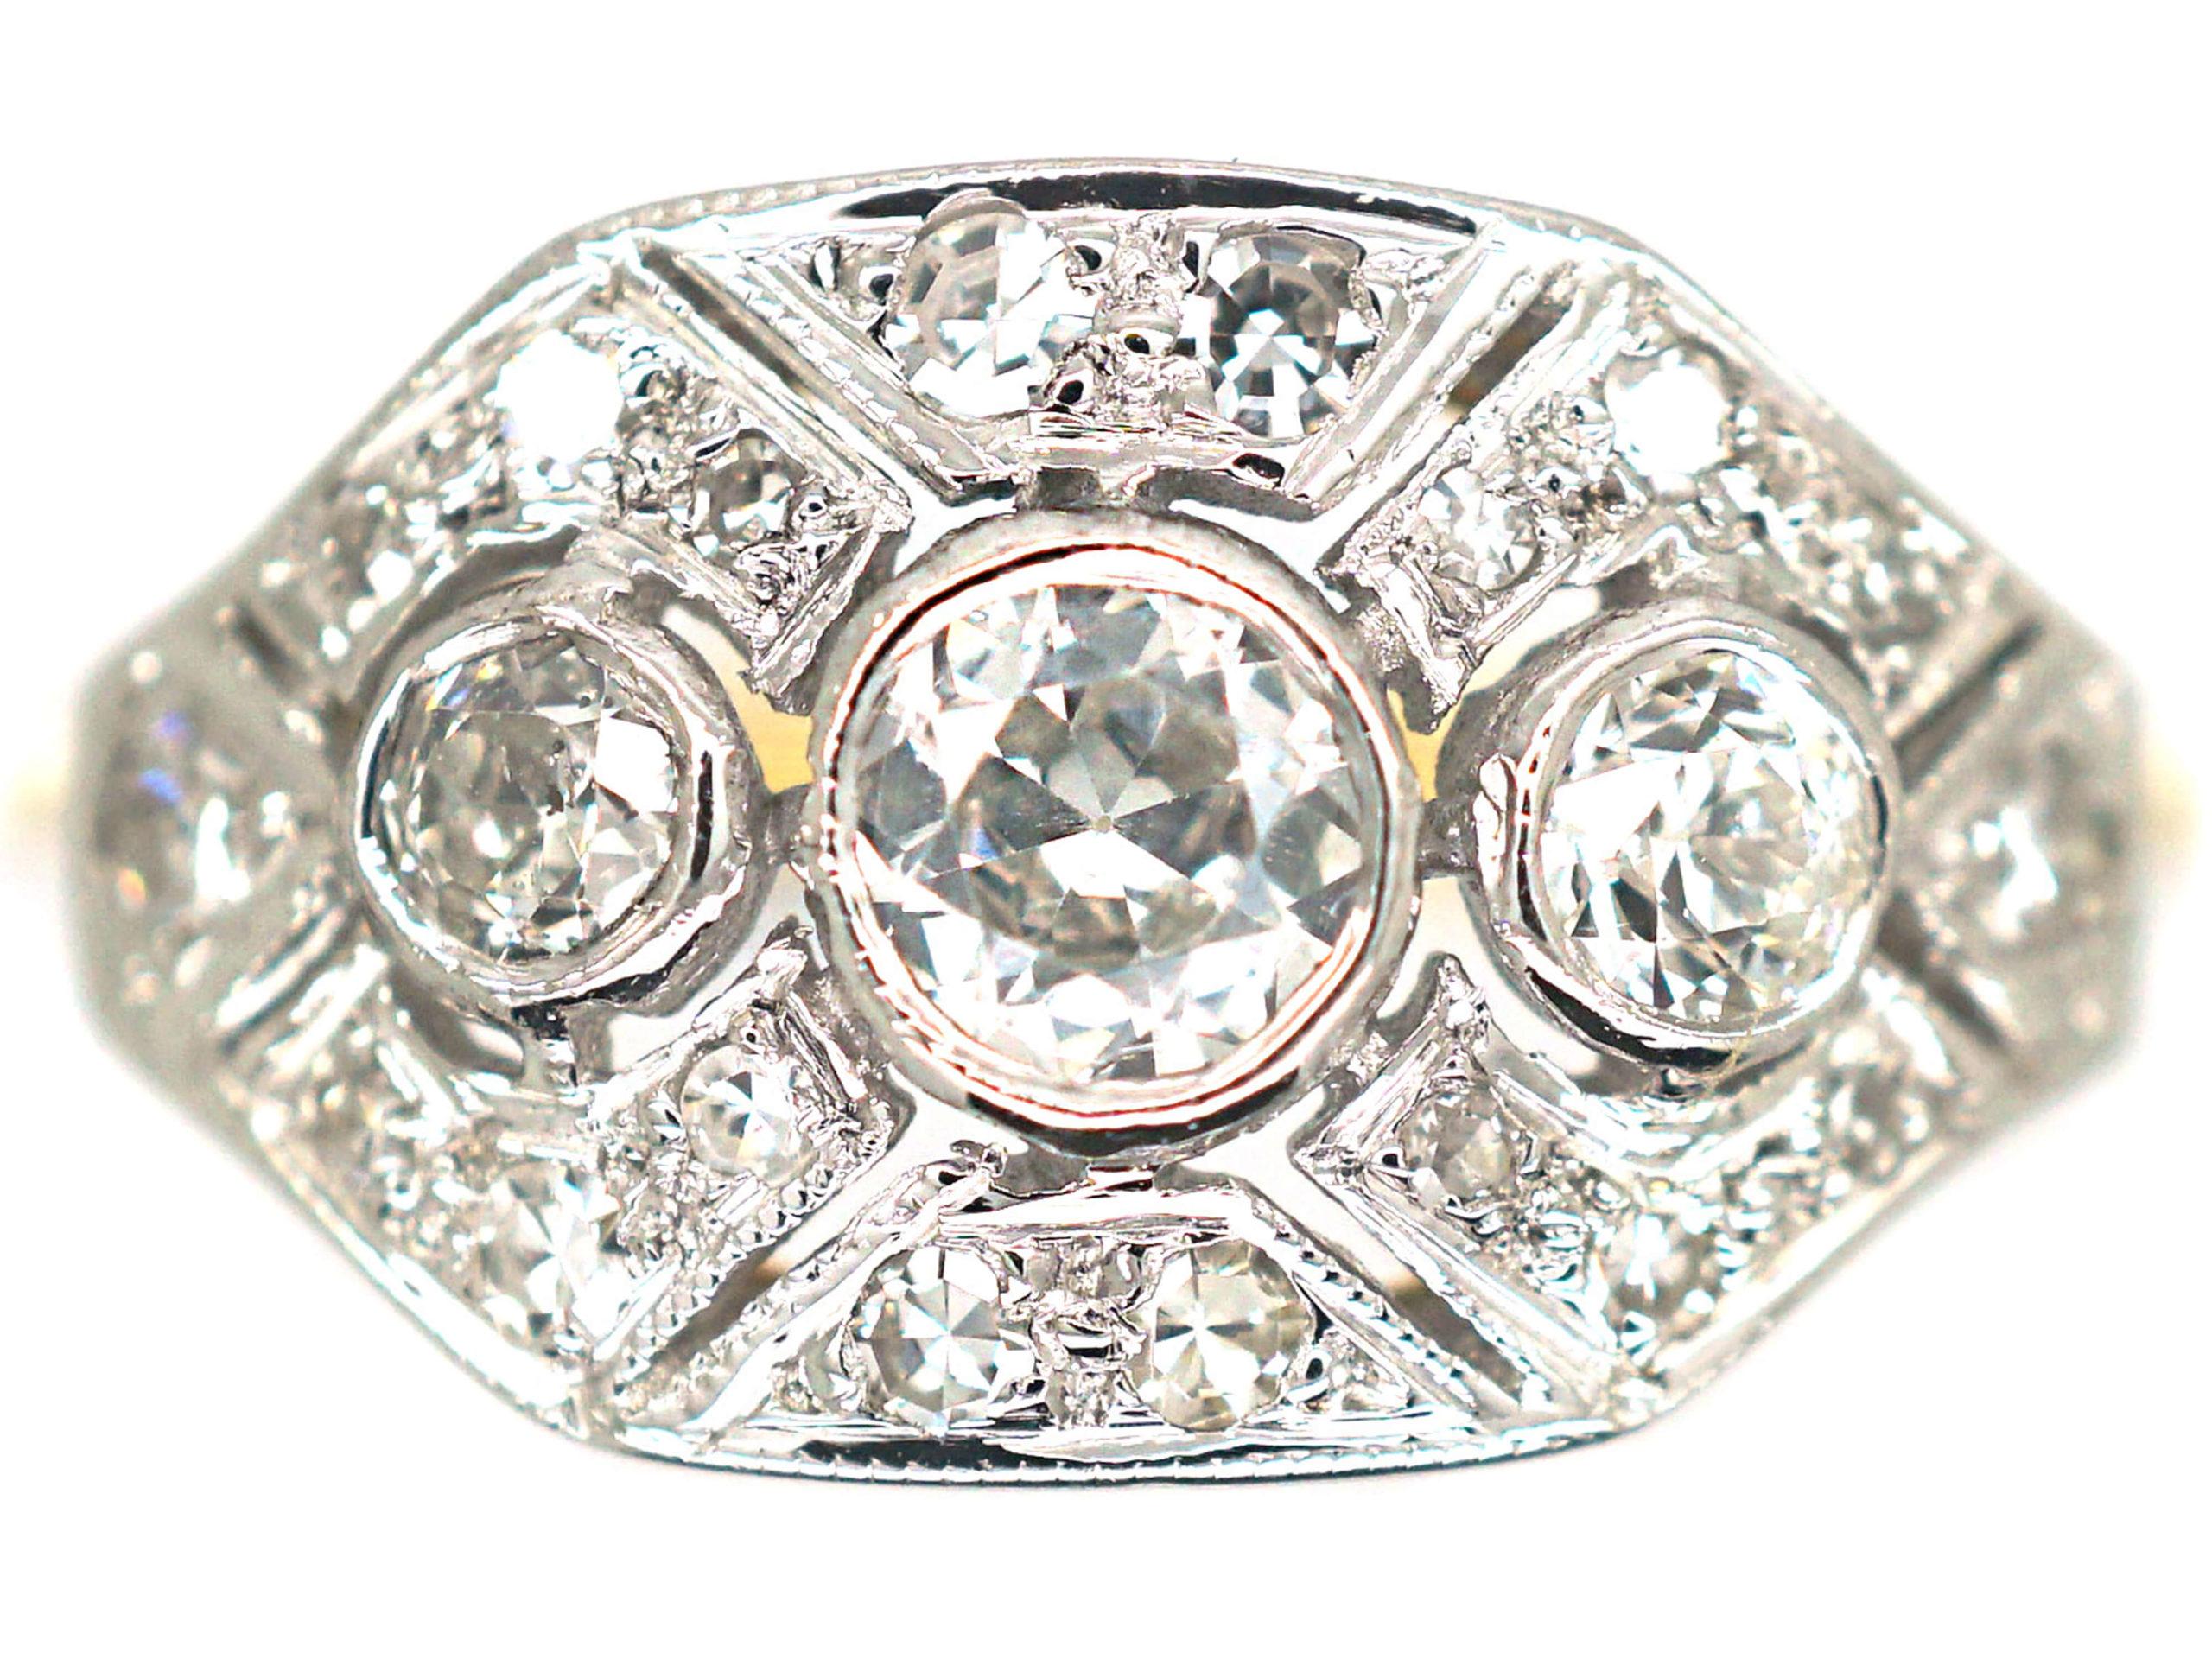 18ct White Gold & Platinum Diamond Octagonal Ring